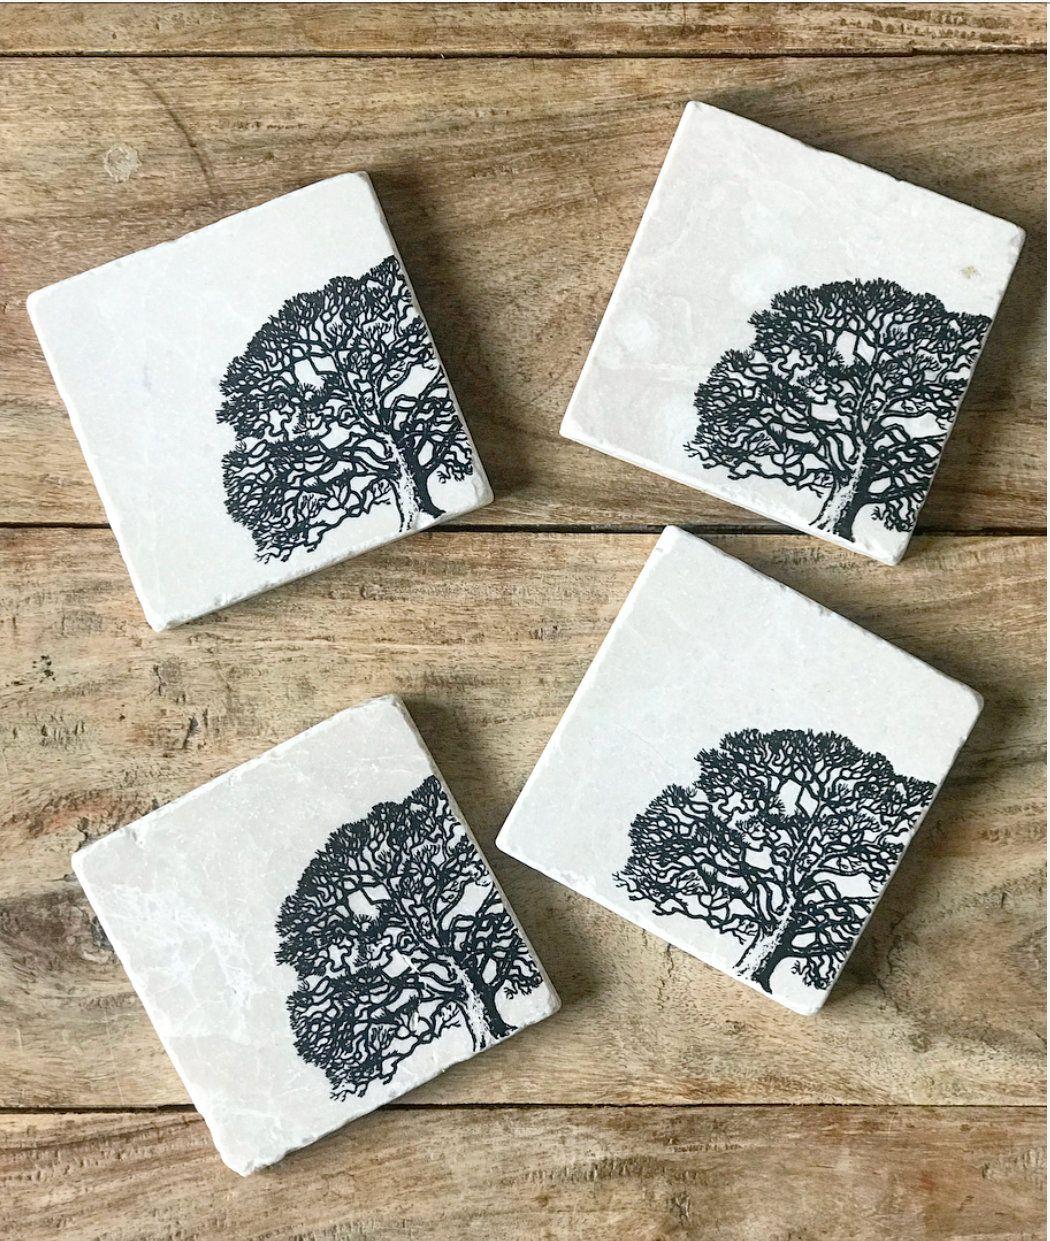 & TREE design natural stone coaster tableware